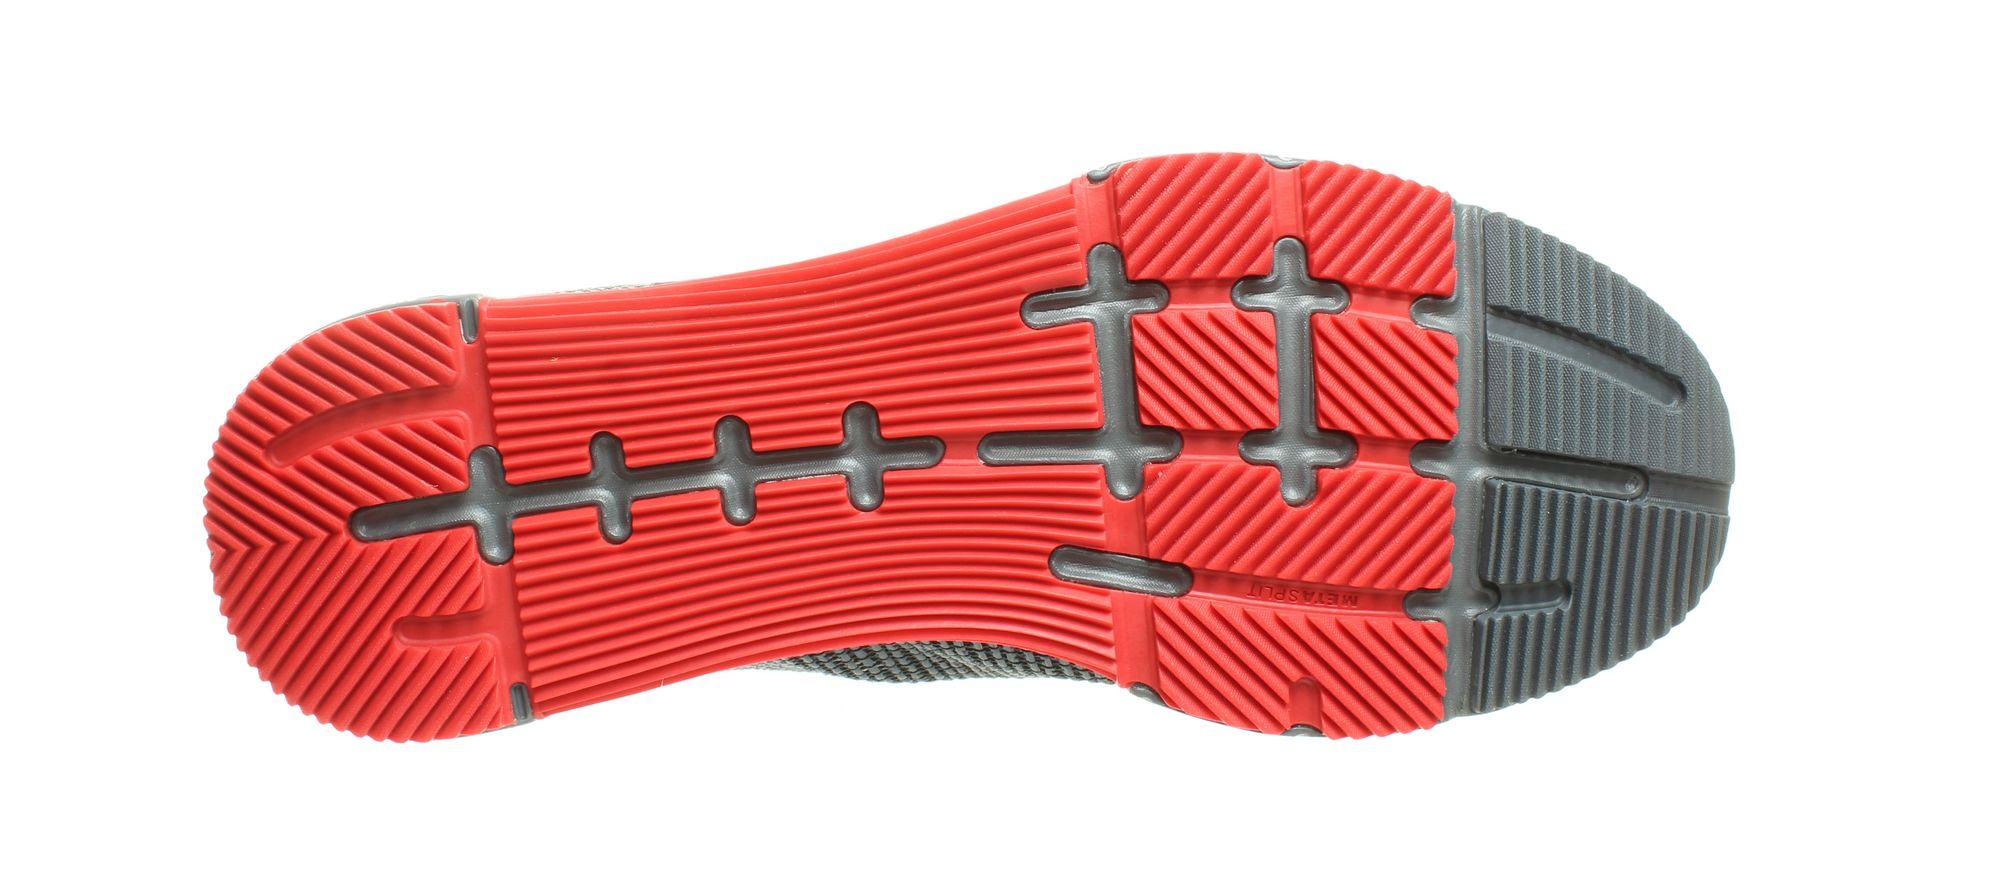 Reebok-Mens-Athletic-Speed-TR-Flexweave-Cross-Training-Shoes thumbnail 13